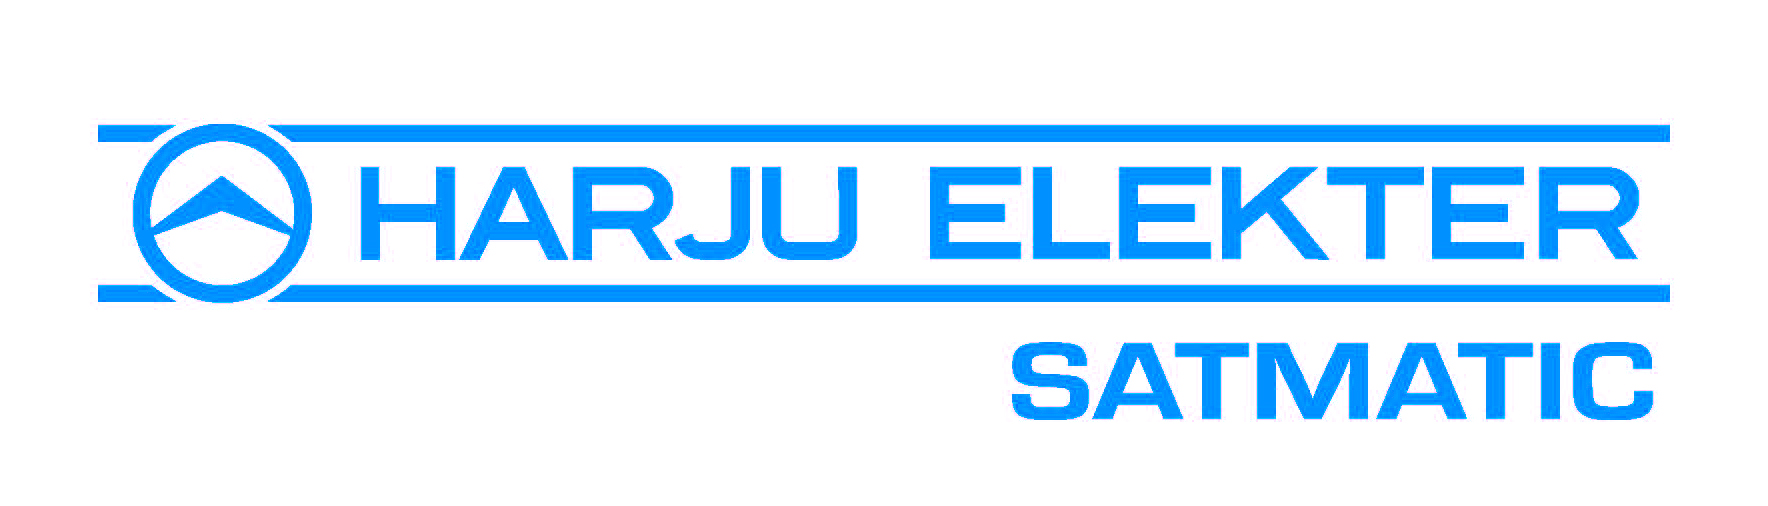 Harju Elekter Satmatic